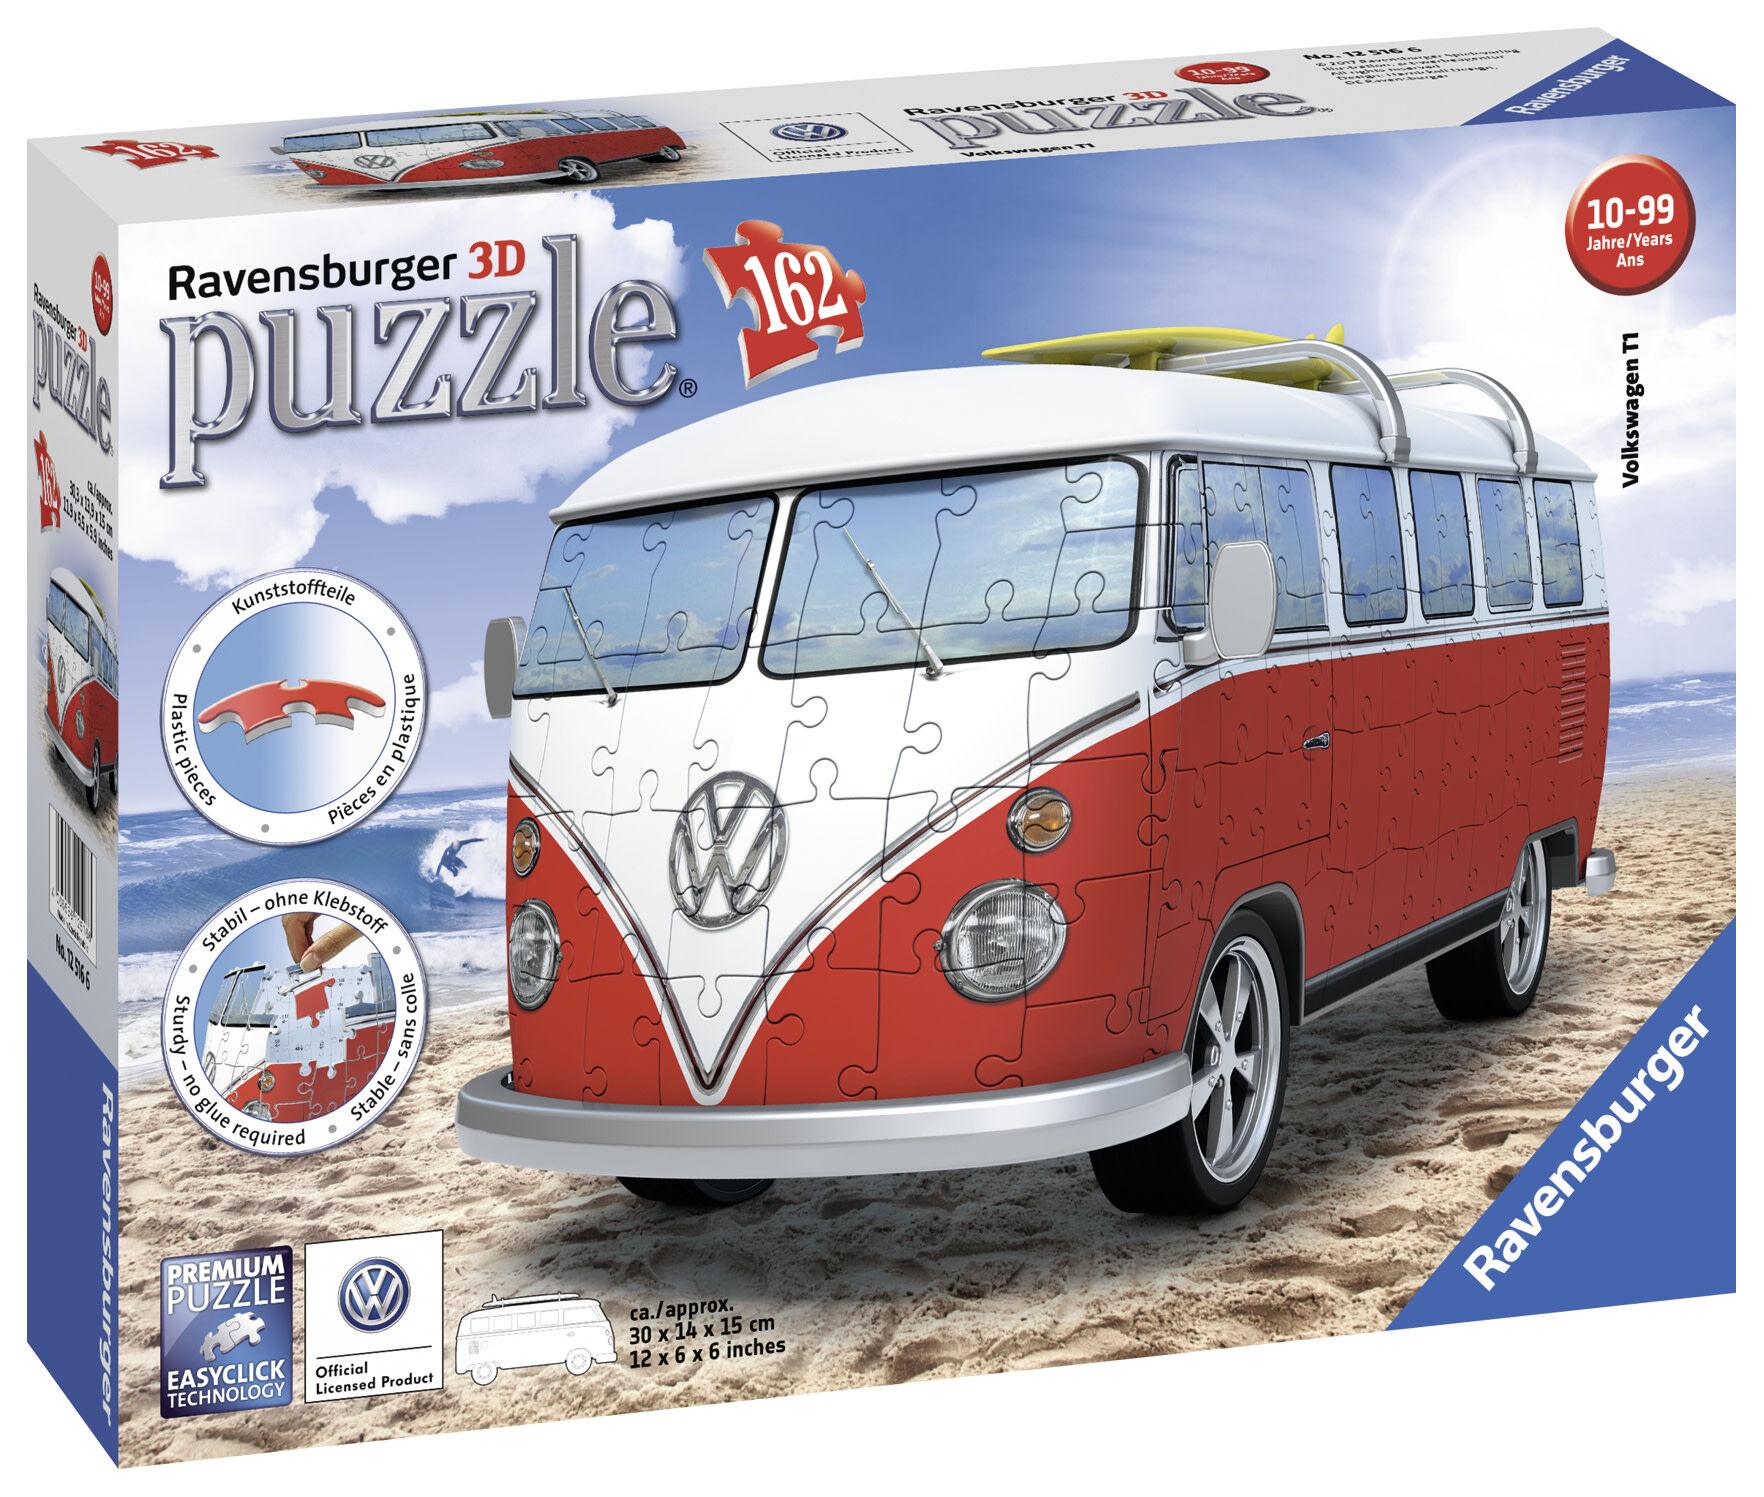 Ravensburger Volkswagen T1 Surfer Edition 162p 3D palapeli